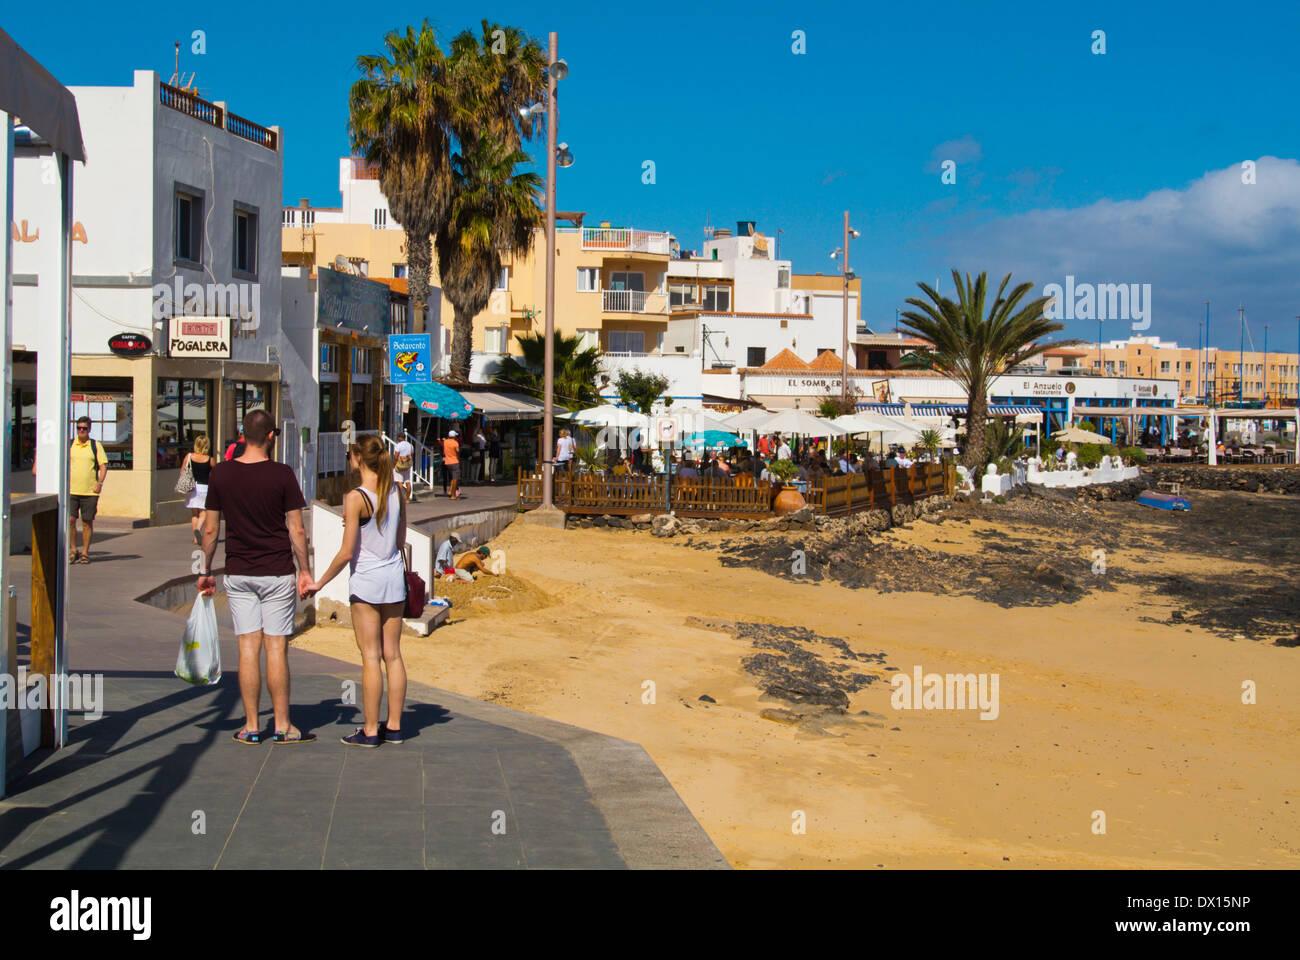 Paseo Maritimo Uferpromenade, Corralejo, Fuerteventura, Kanarische Inseln, Spanien, Europa Stockbild